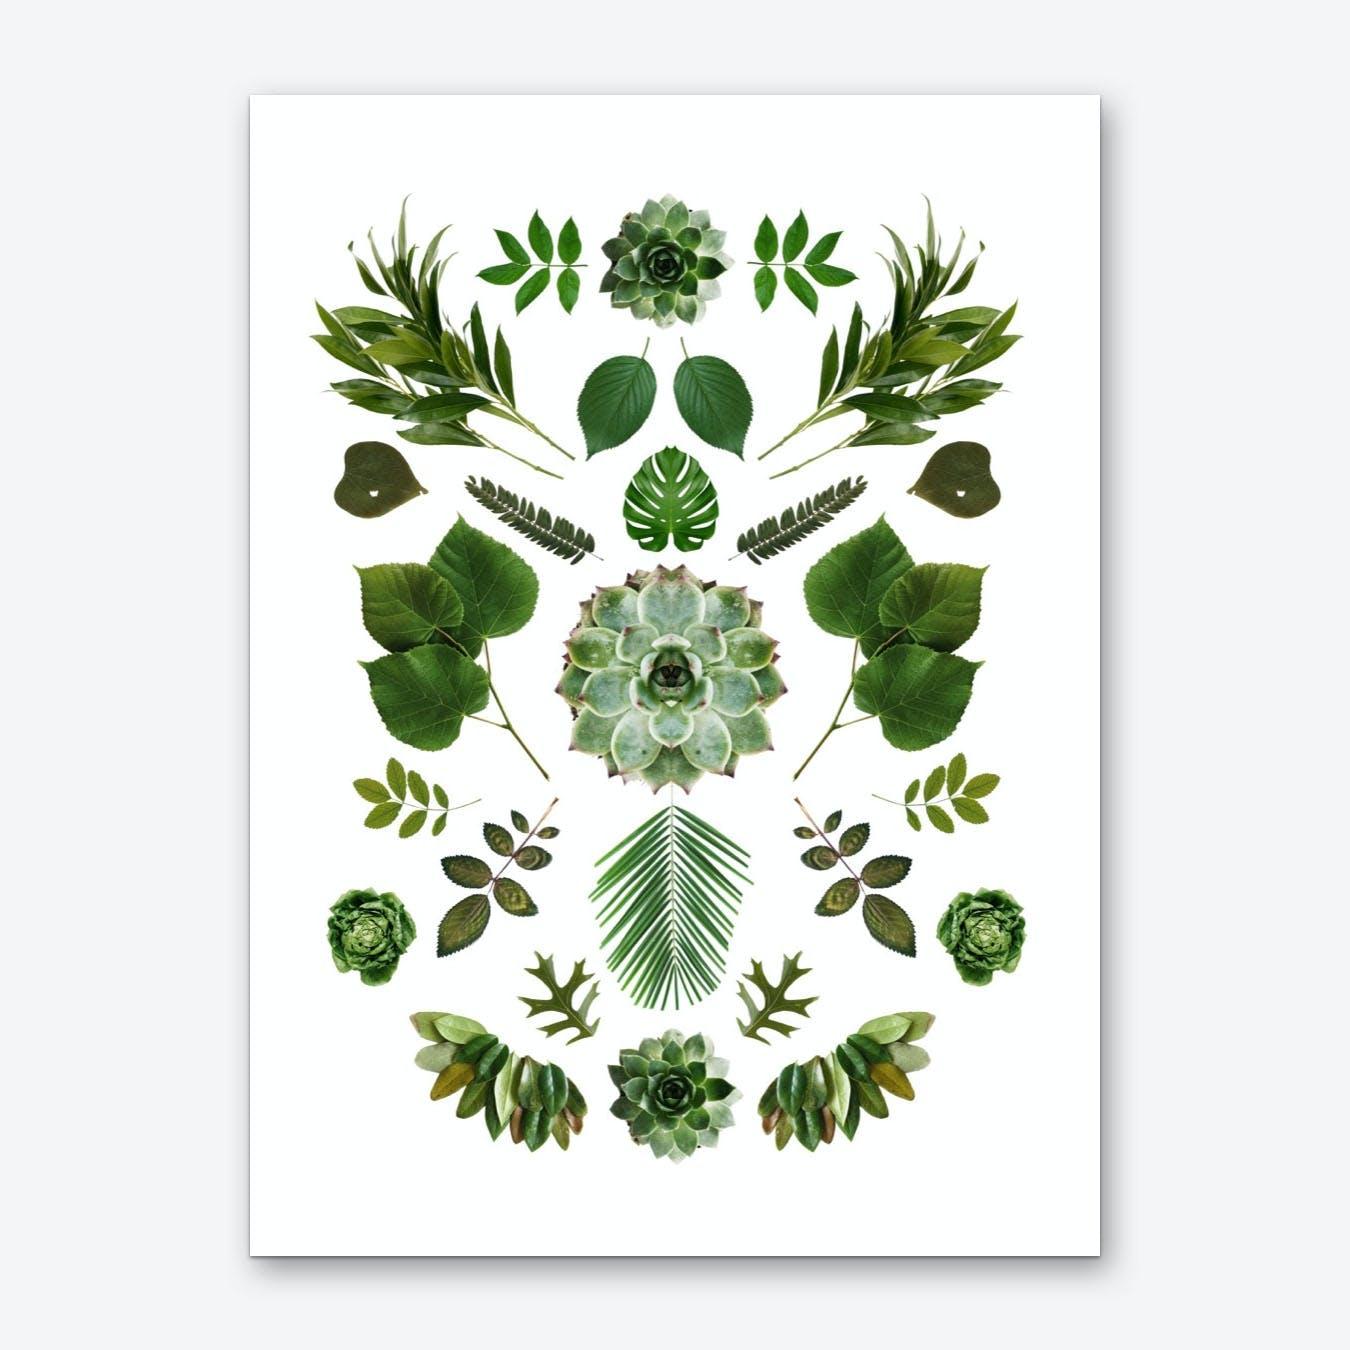 Green Collage Art Print